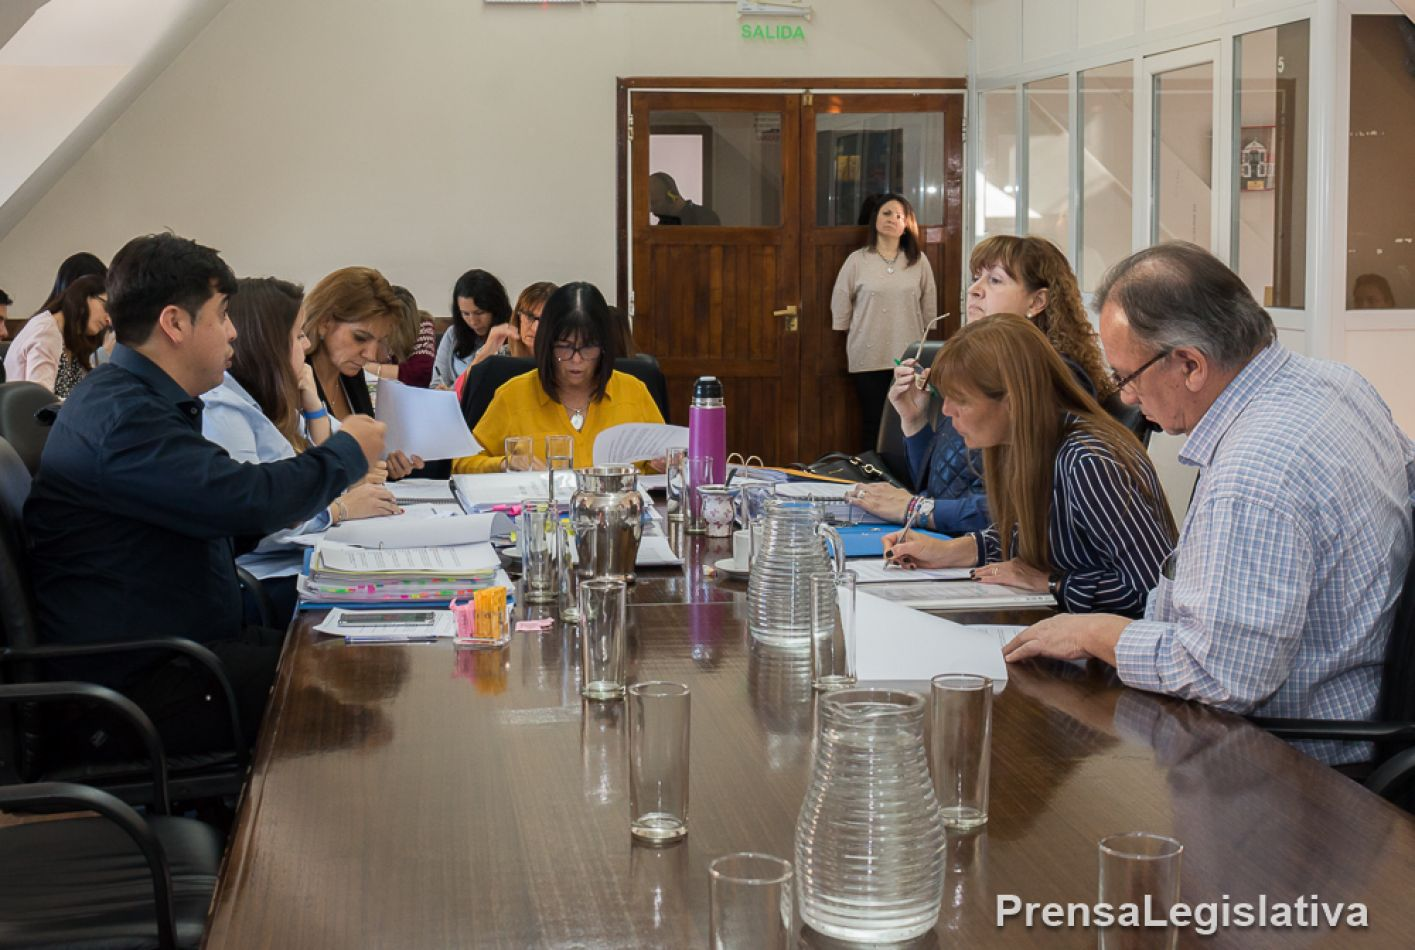 Legislatura de Ushuaia